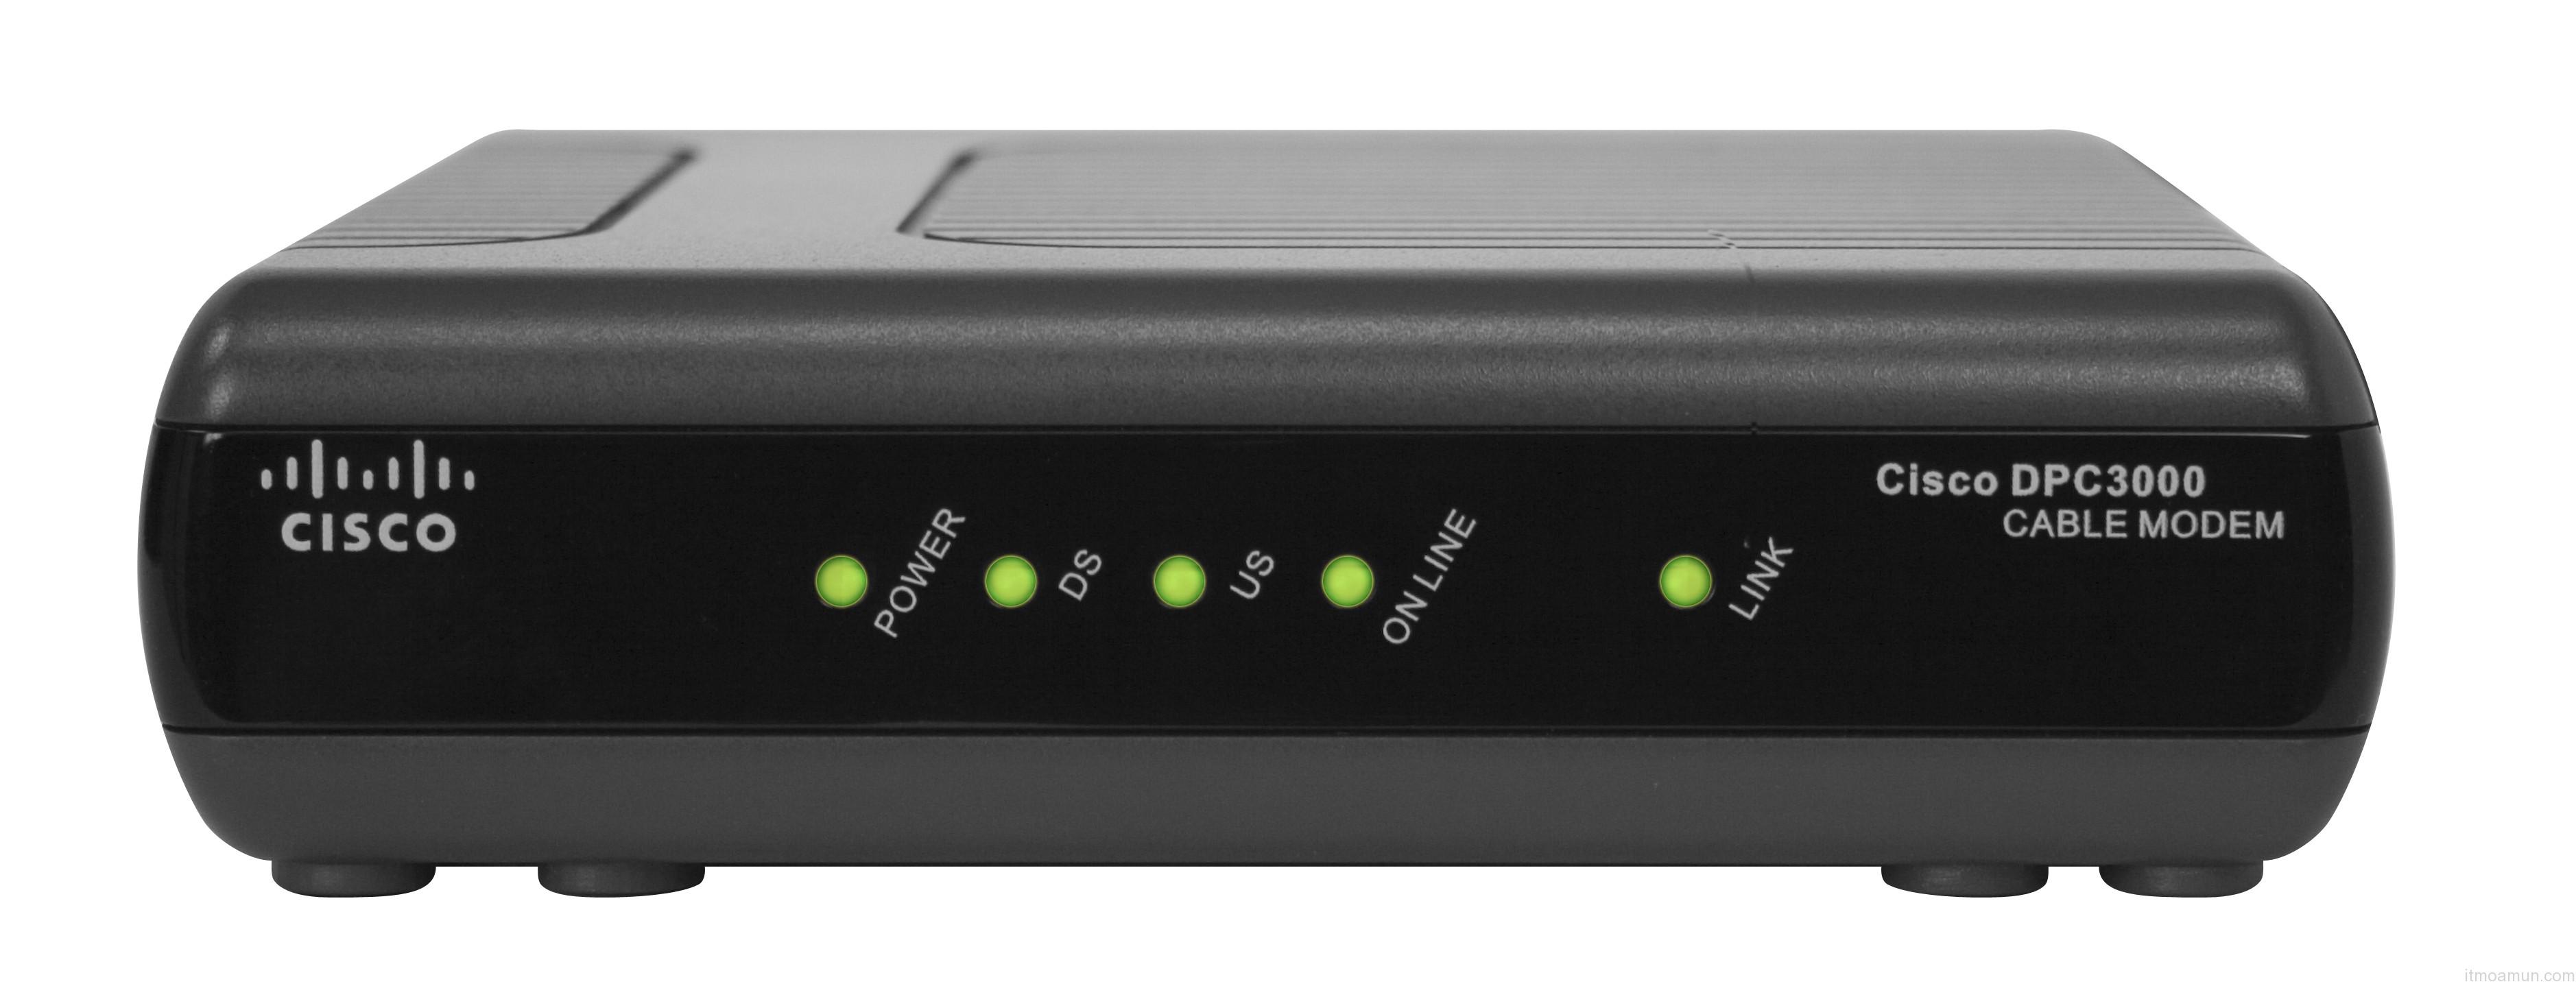 Cisco, Cisco Network, Docsis 3, การเช่าซื้อ Network, เช่าใช้ Cisco